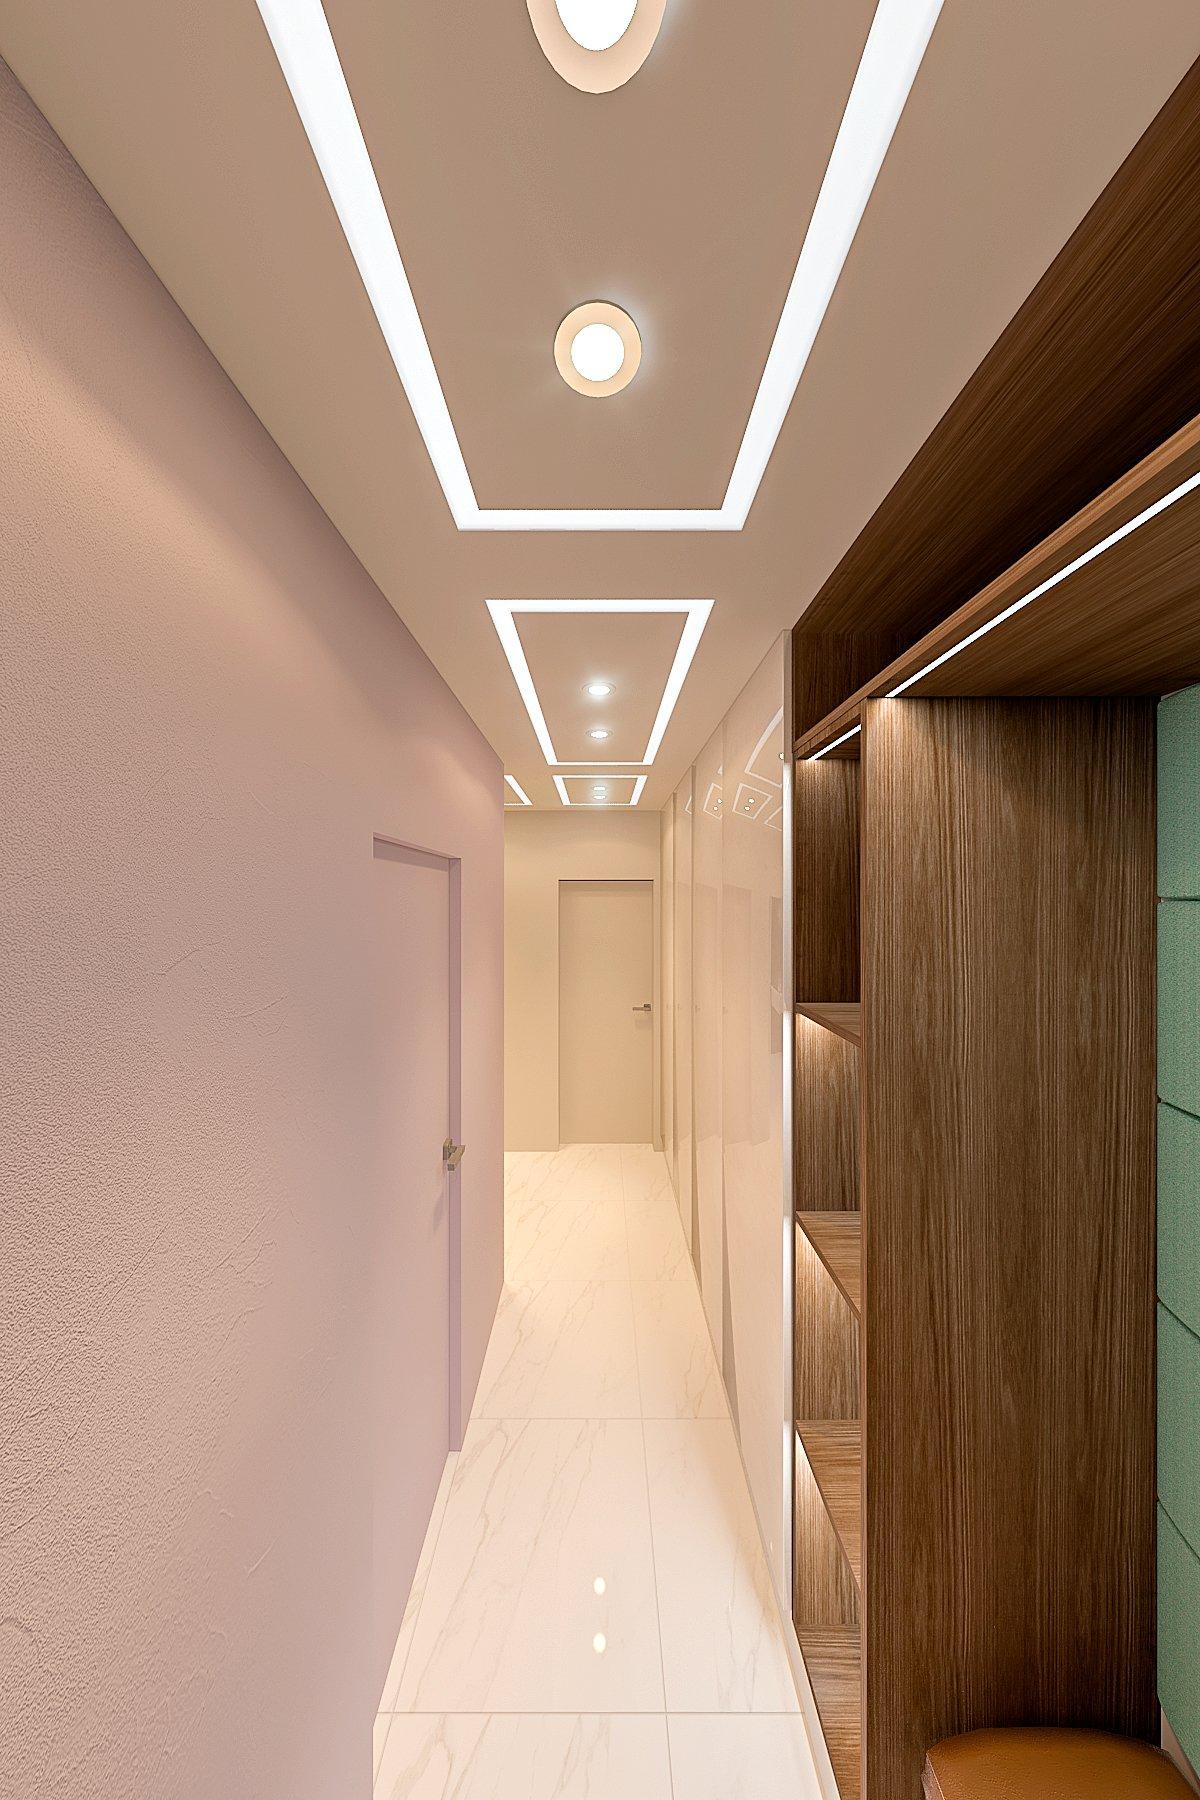 Прихожая, коридор, вид со входа